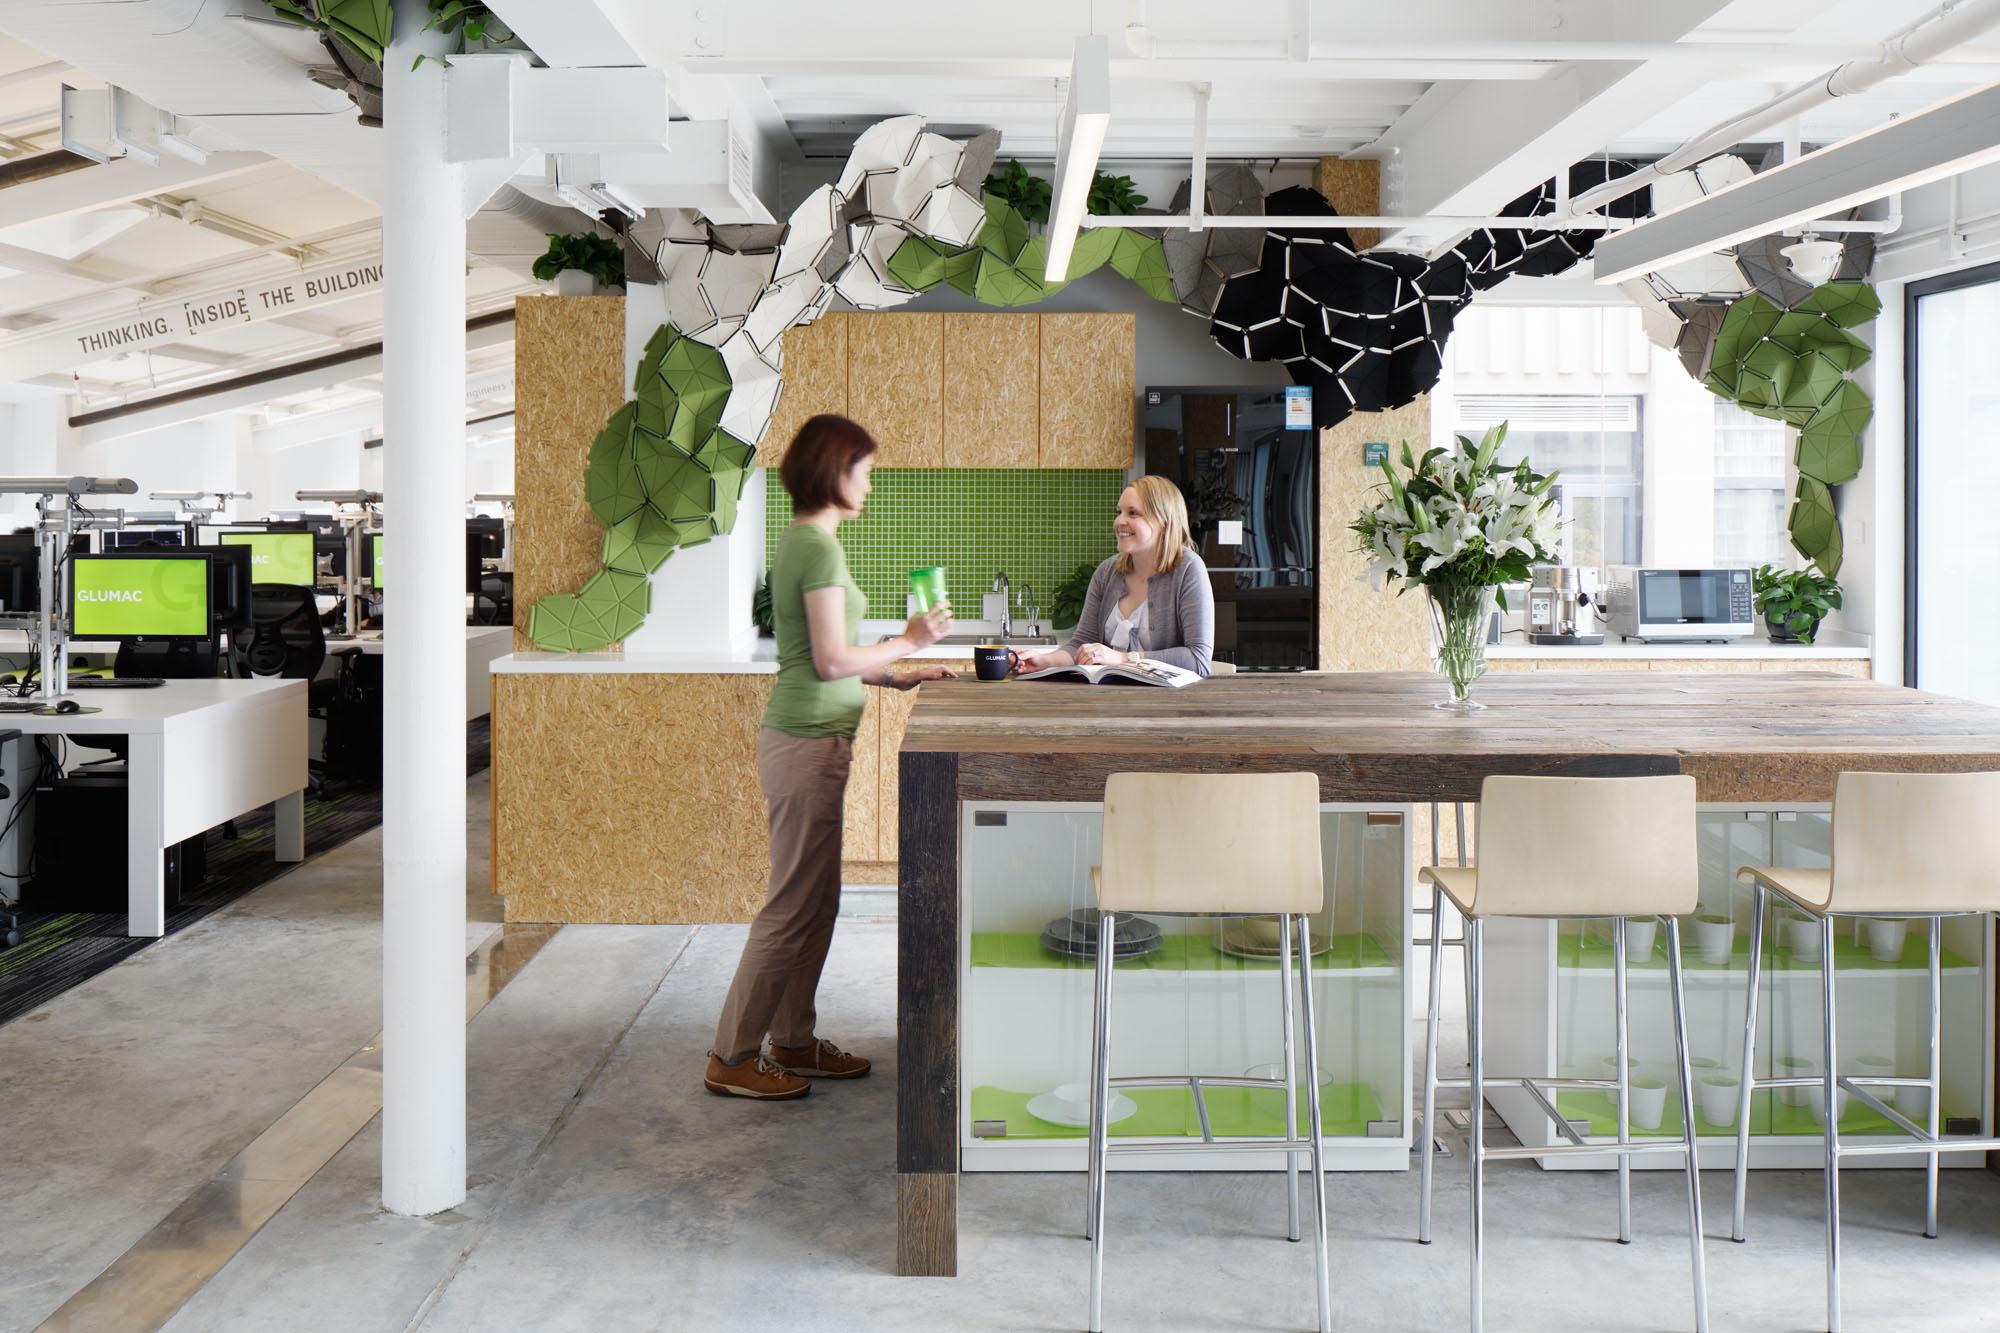 leed earth project pioneers the glumac shanghai office aims high